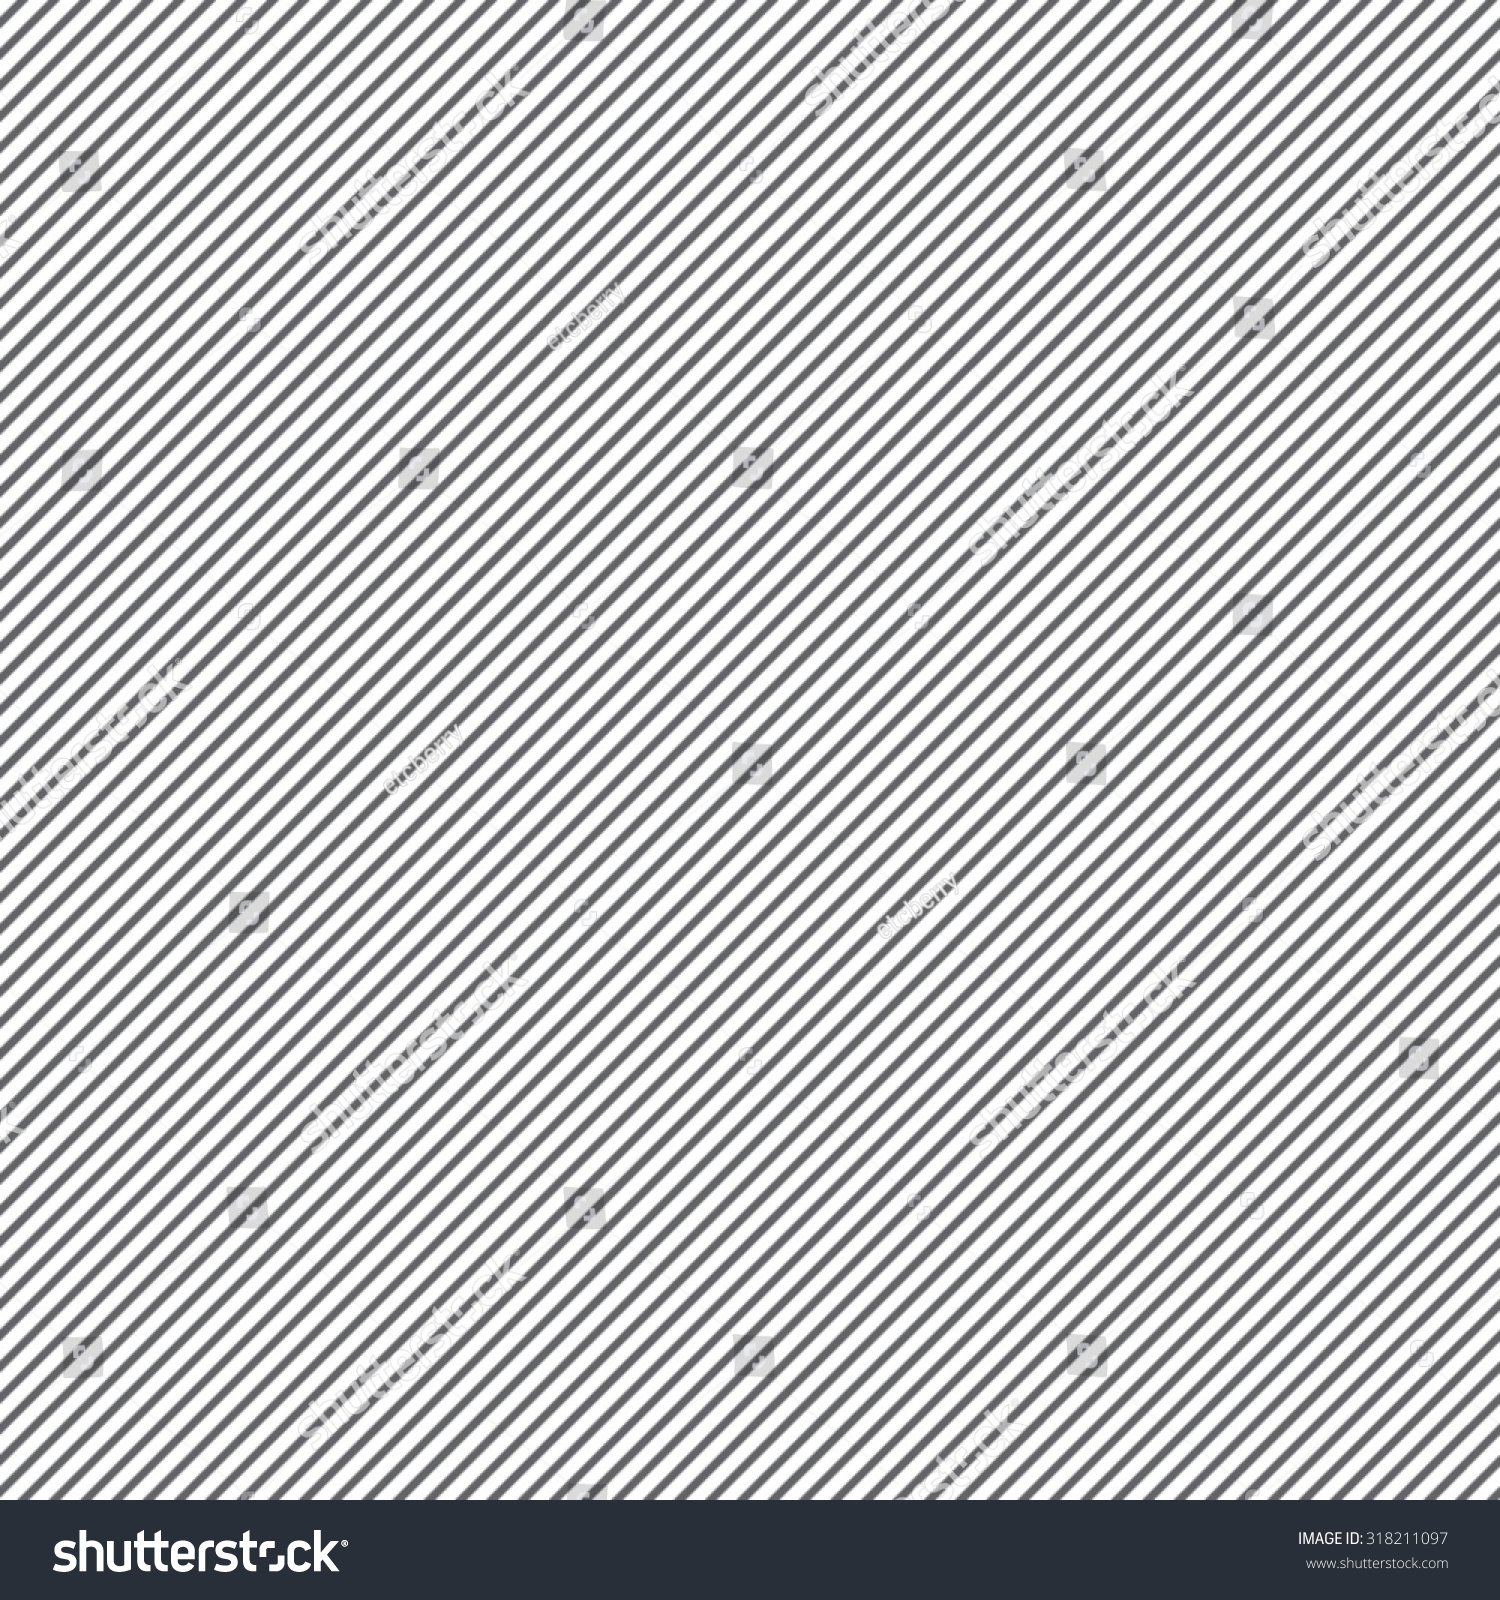 Line Texture Seamless : Seamless geometric black pattern diagonal lines stock